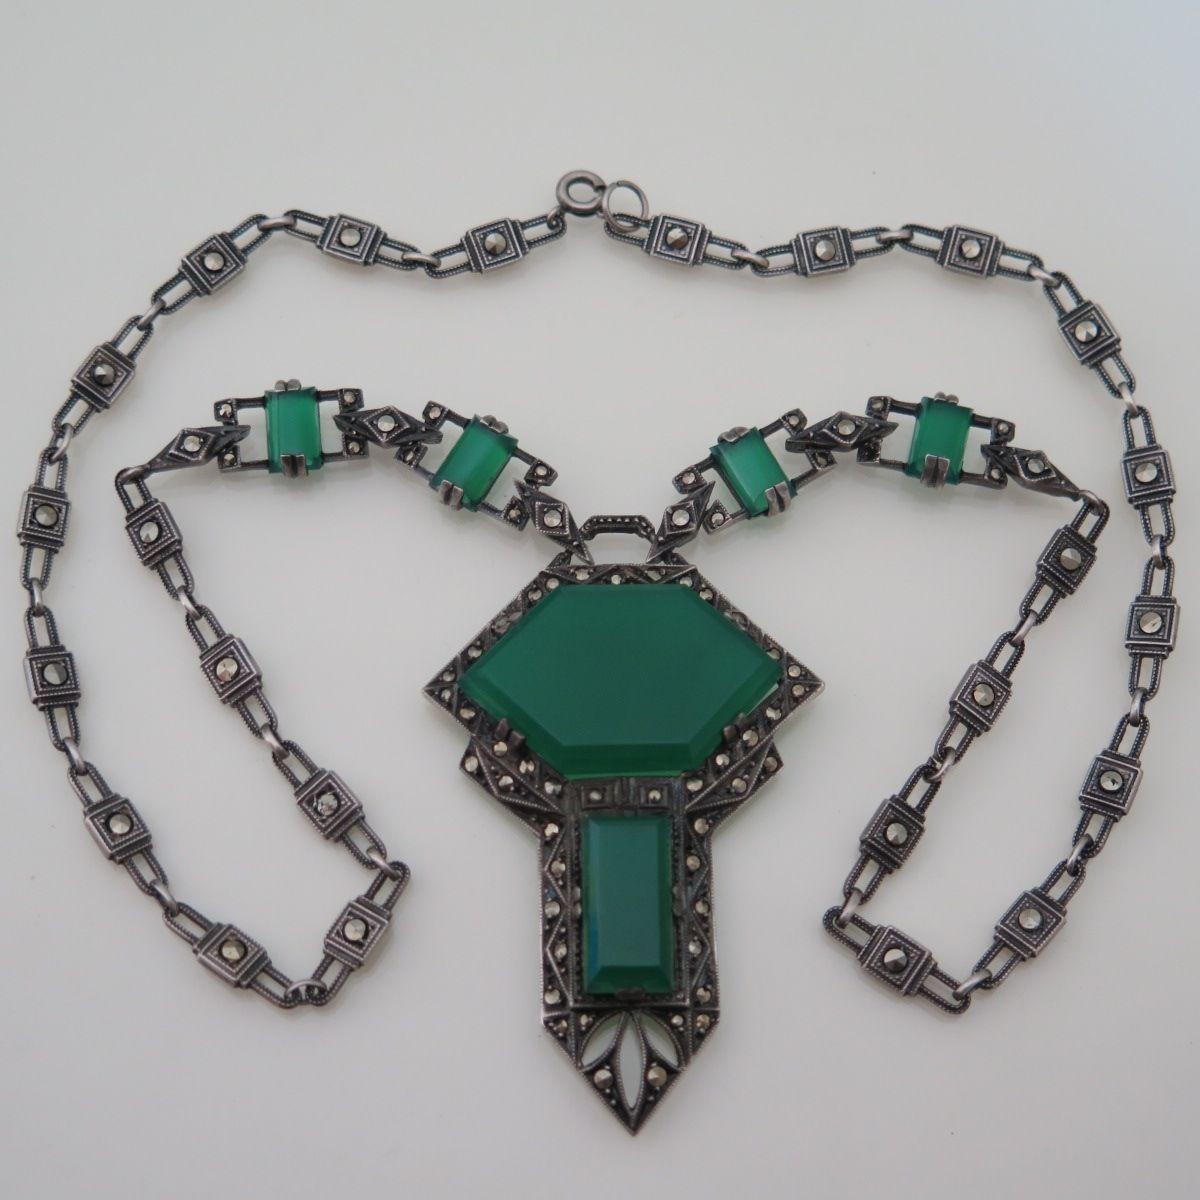 Vintage Art Deco Sterling Silver Natural Chrysoprase Marcasite Pendant Necklace | eBay - fantastic chain!